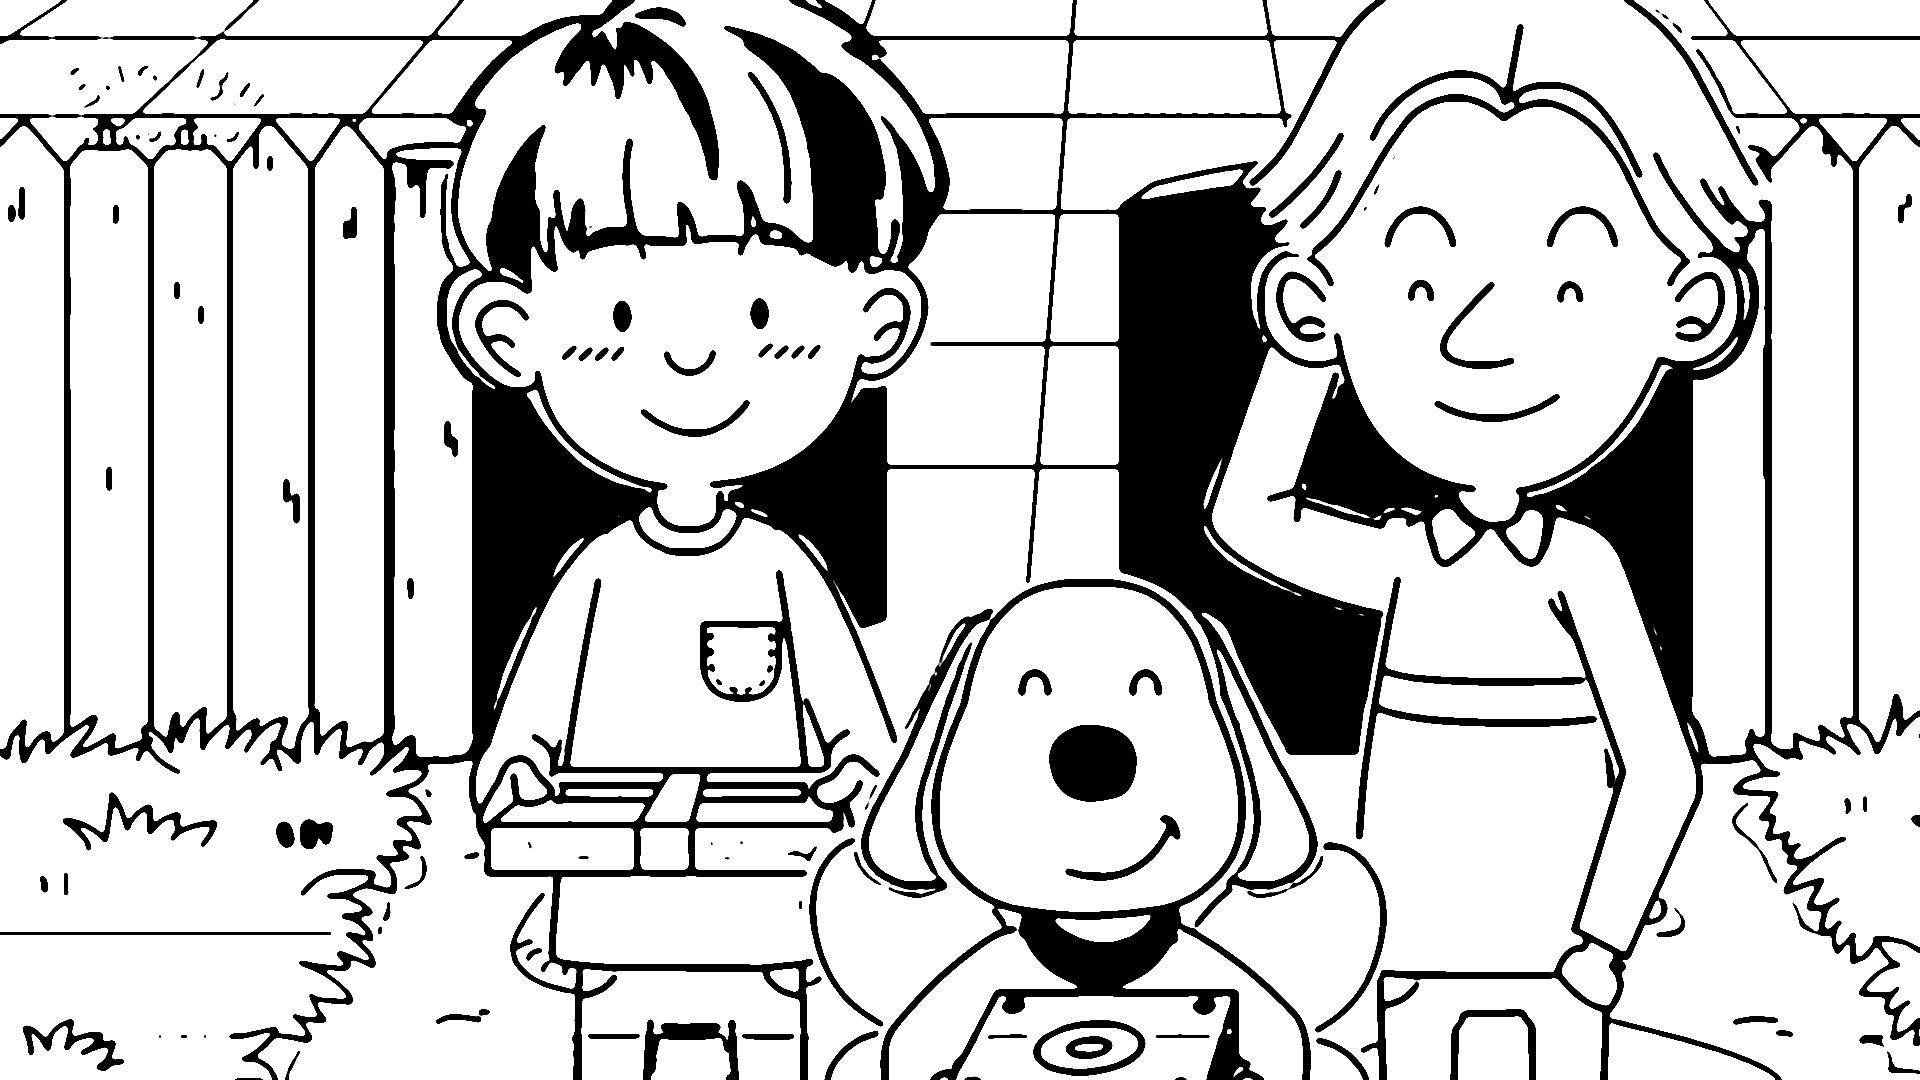 Speaking Cartoon Kids Coloring Page 01